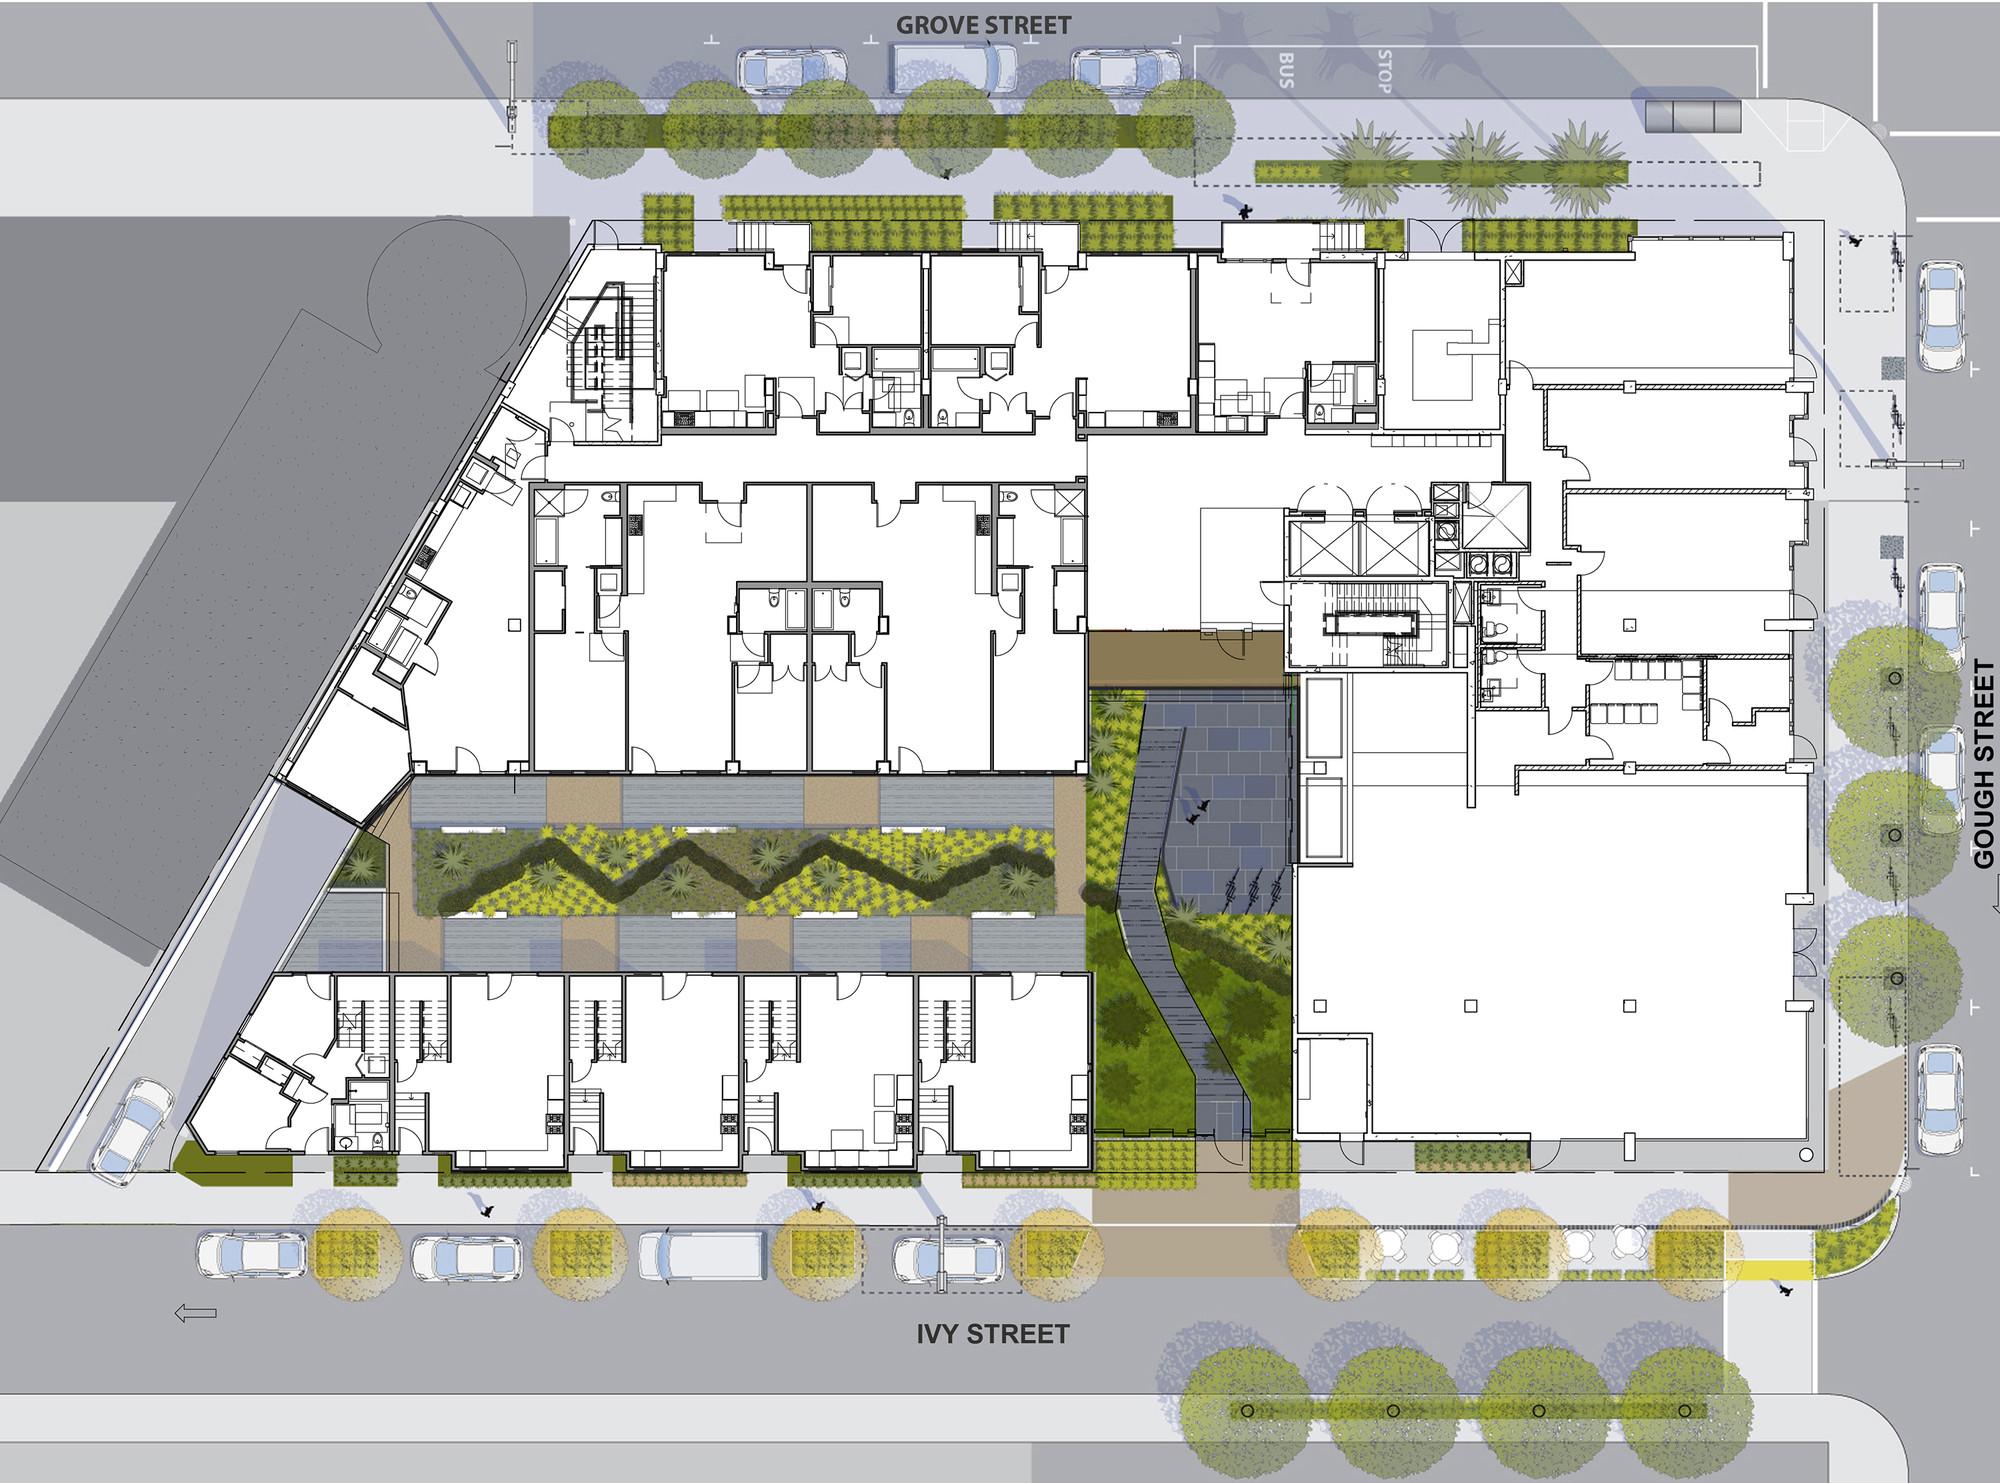 300 Ivy Street / David Baker Architects | ArchDaily